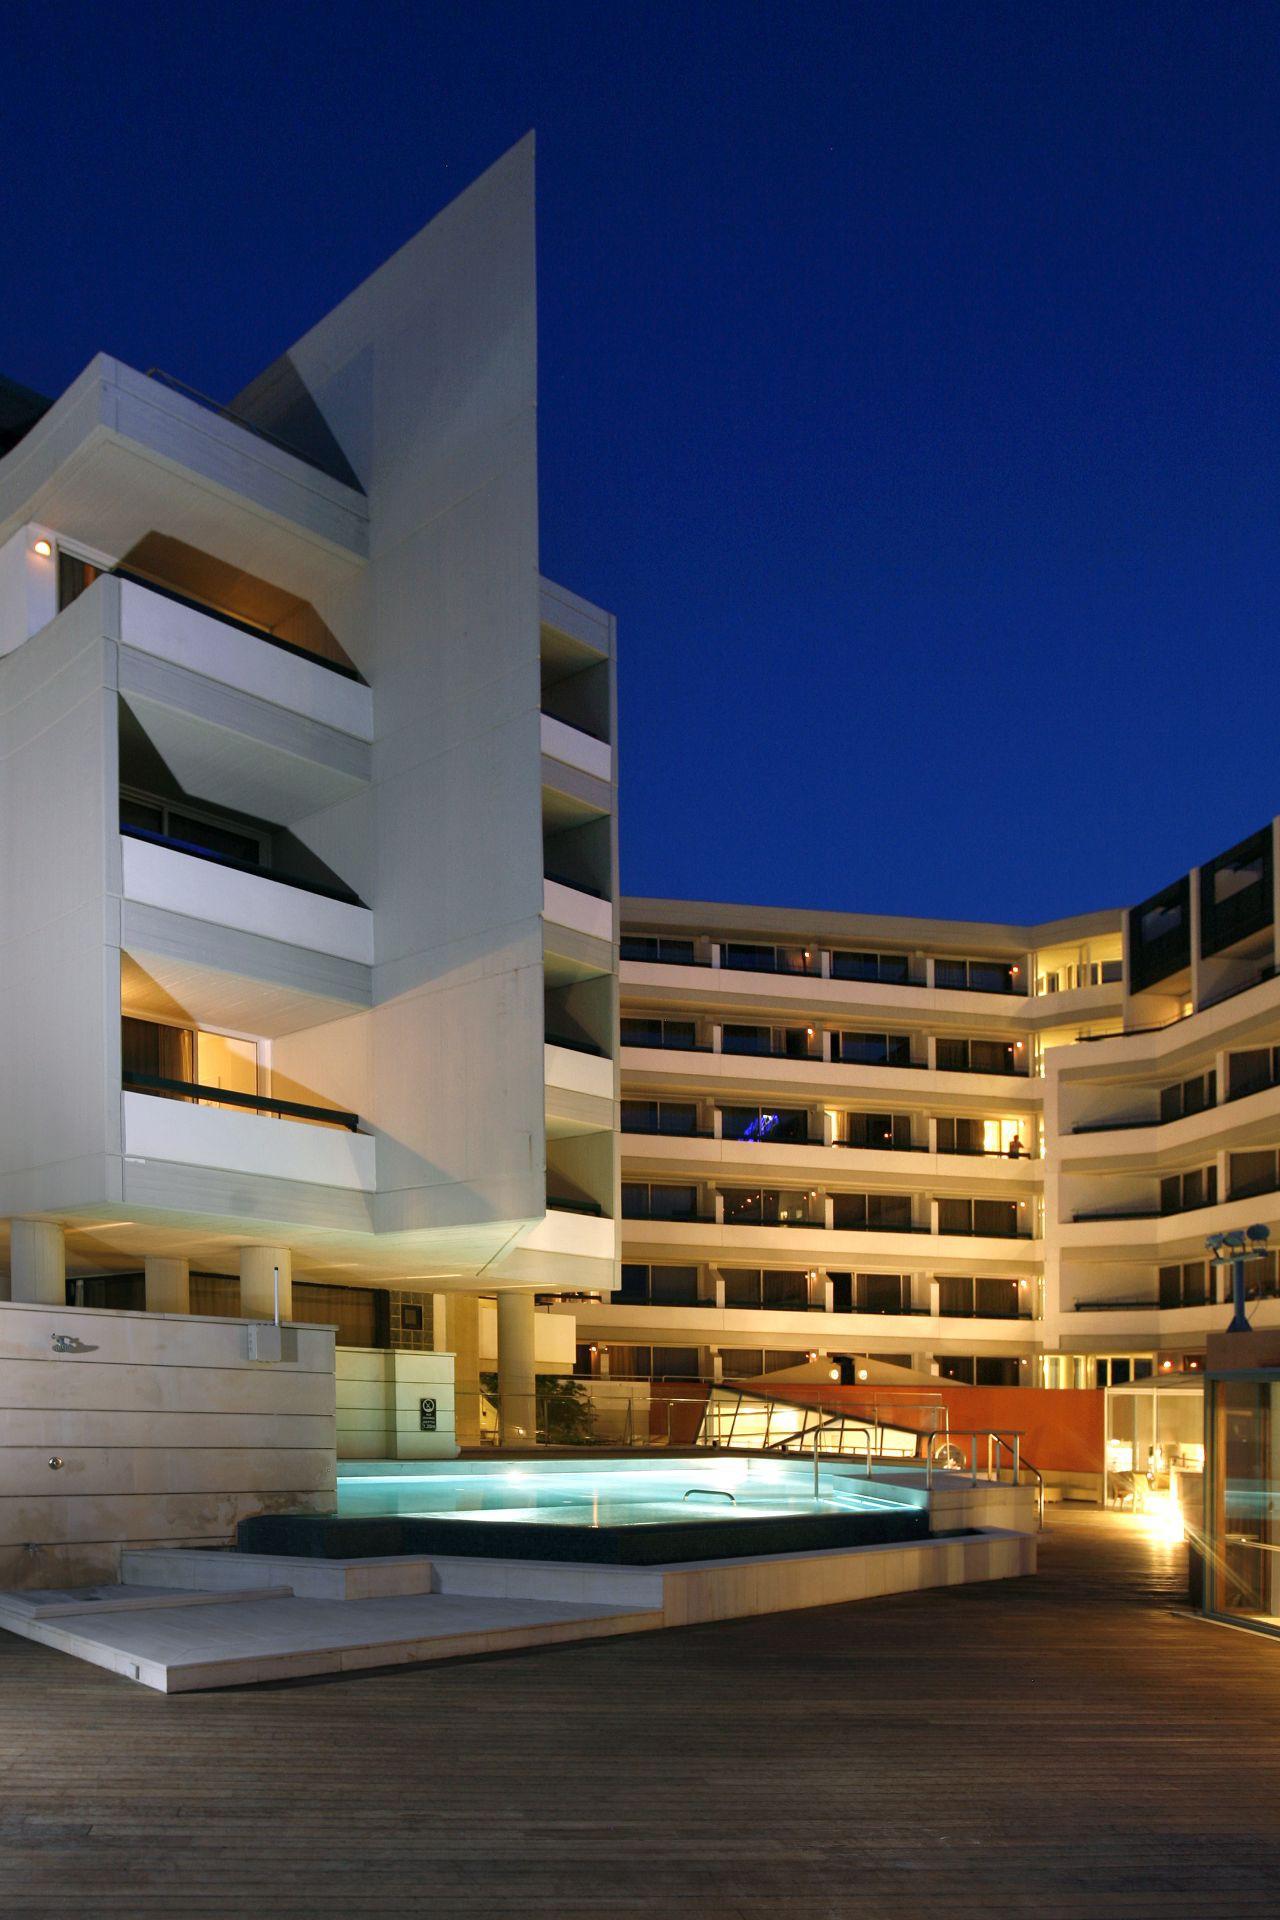 Aquila Porto Rethymno Hotel Exterior Hotels In Crete Aquila Hotels Resorts